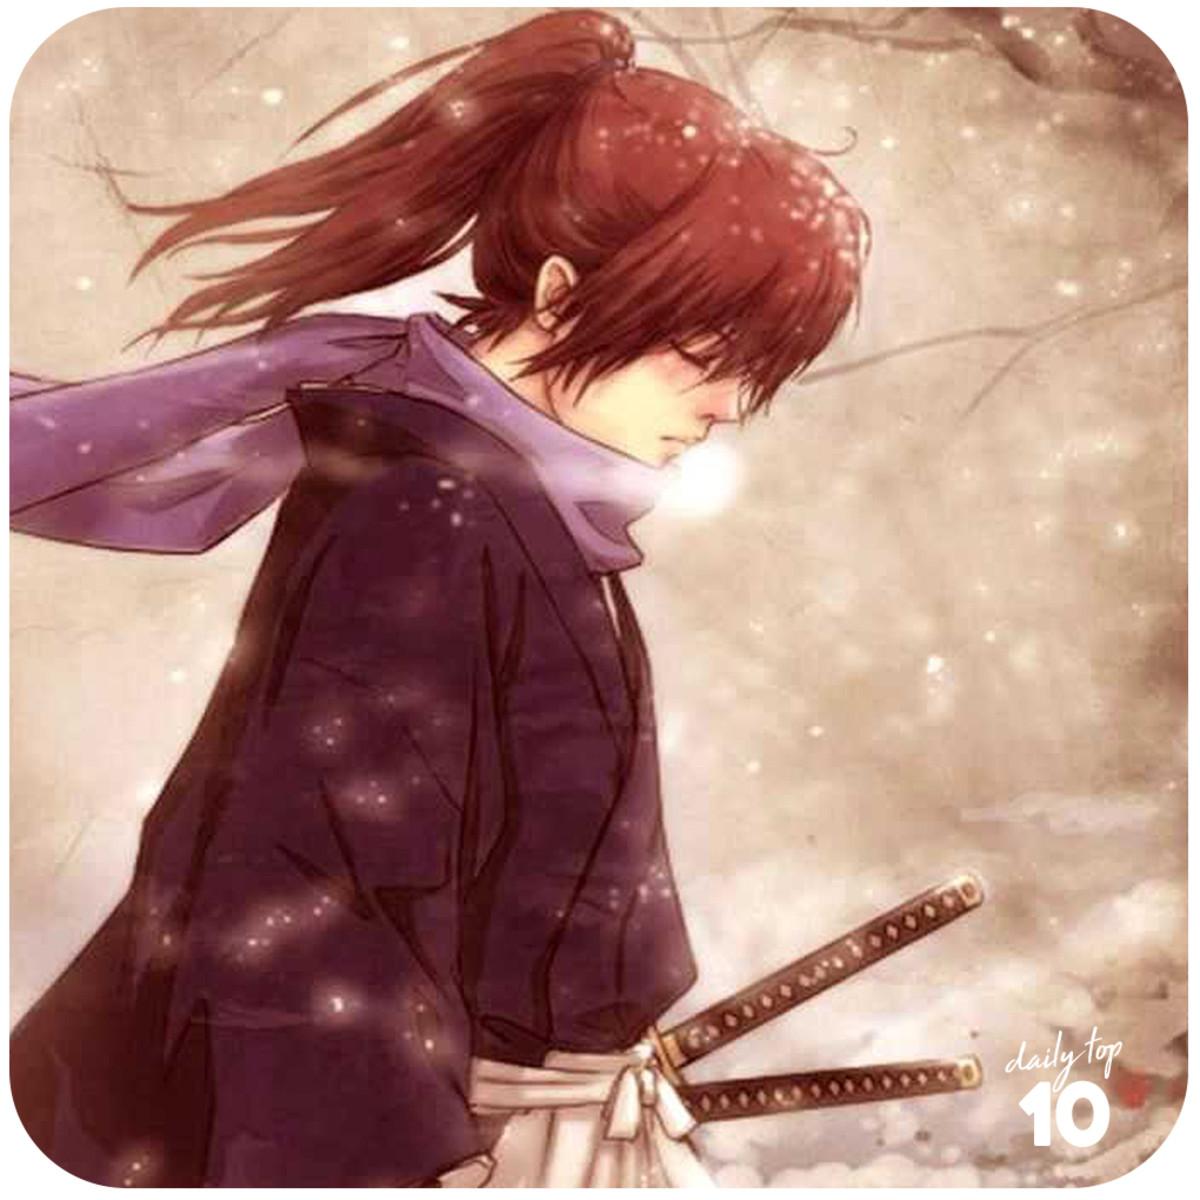 Kenshin the battousai